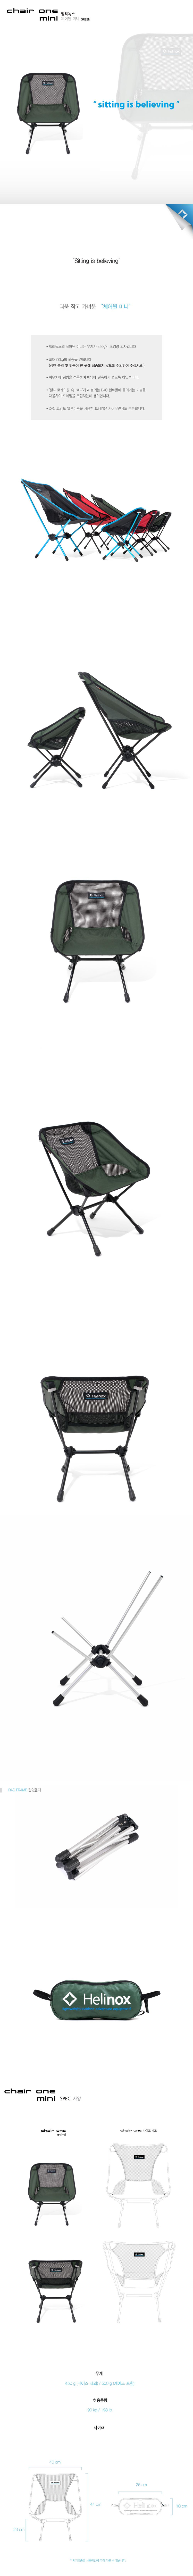 20150709-Helinox_chair-one-mini_상품페이지_GR.jpg